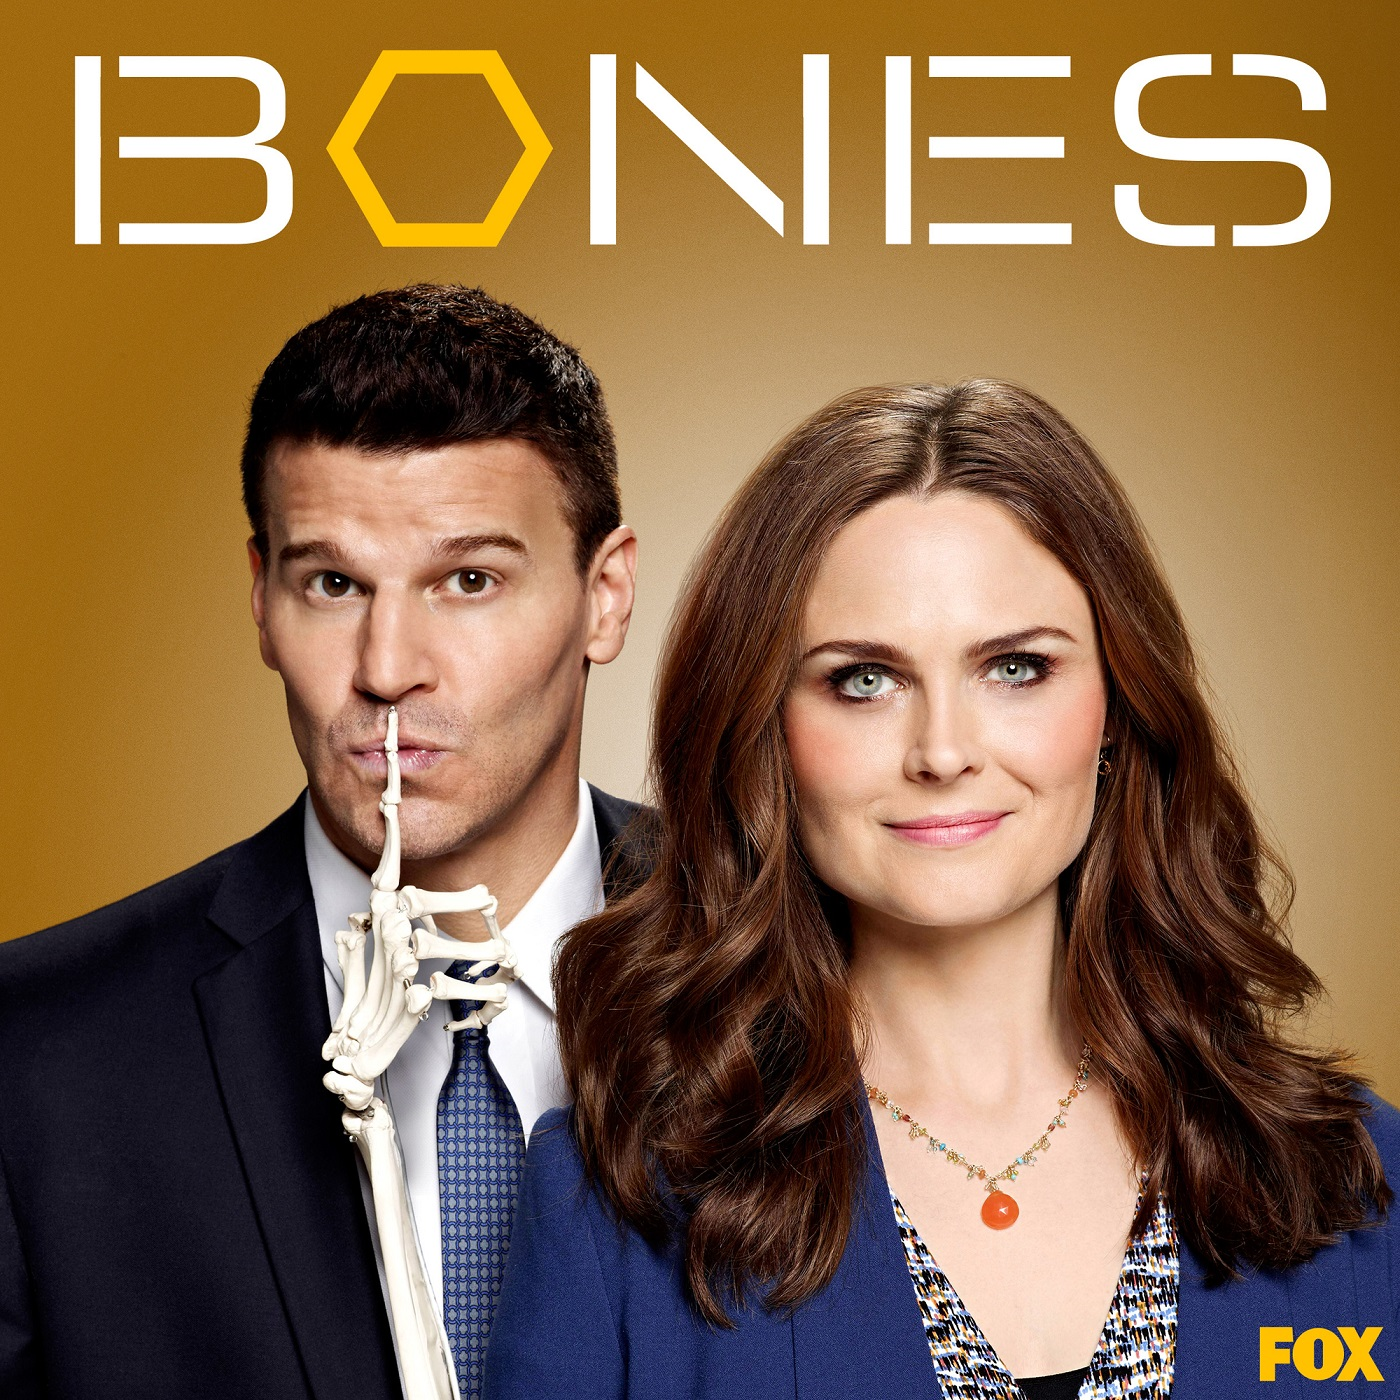 Bones Seasons 01-10   S010E01-E10 HDTV   720P Ibt9